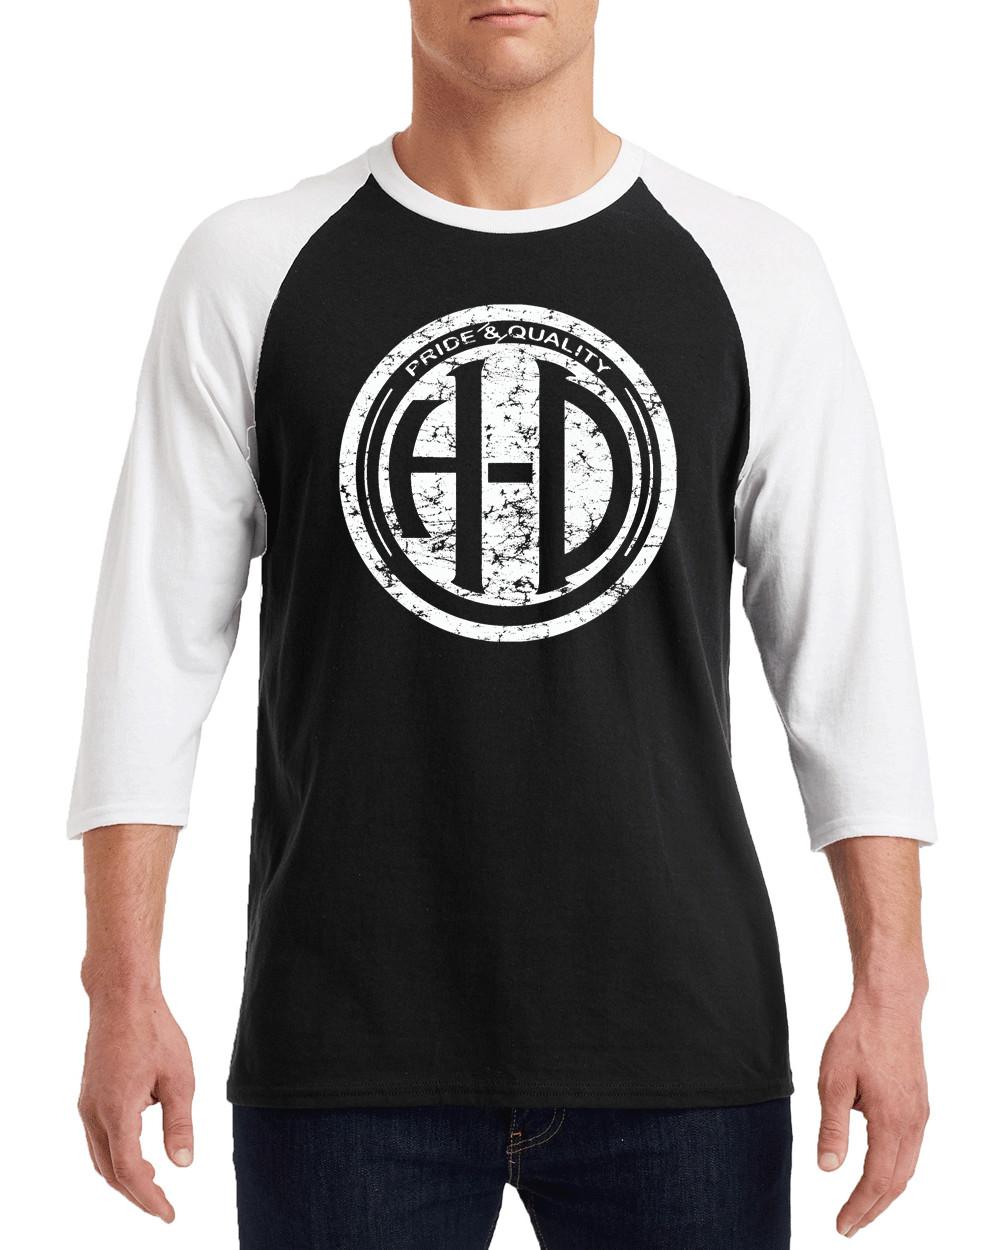 "HARLEY DAVIDSON H-D PRIDE WHITE Logo Gildan G570 3/4 Sleeve Shirt ""FREE SHIPPING"""